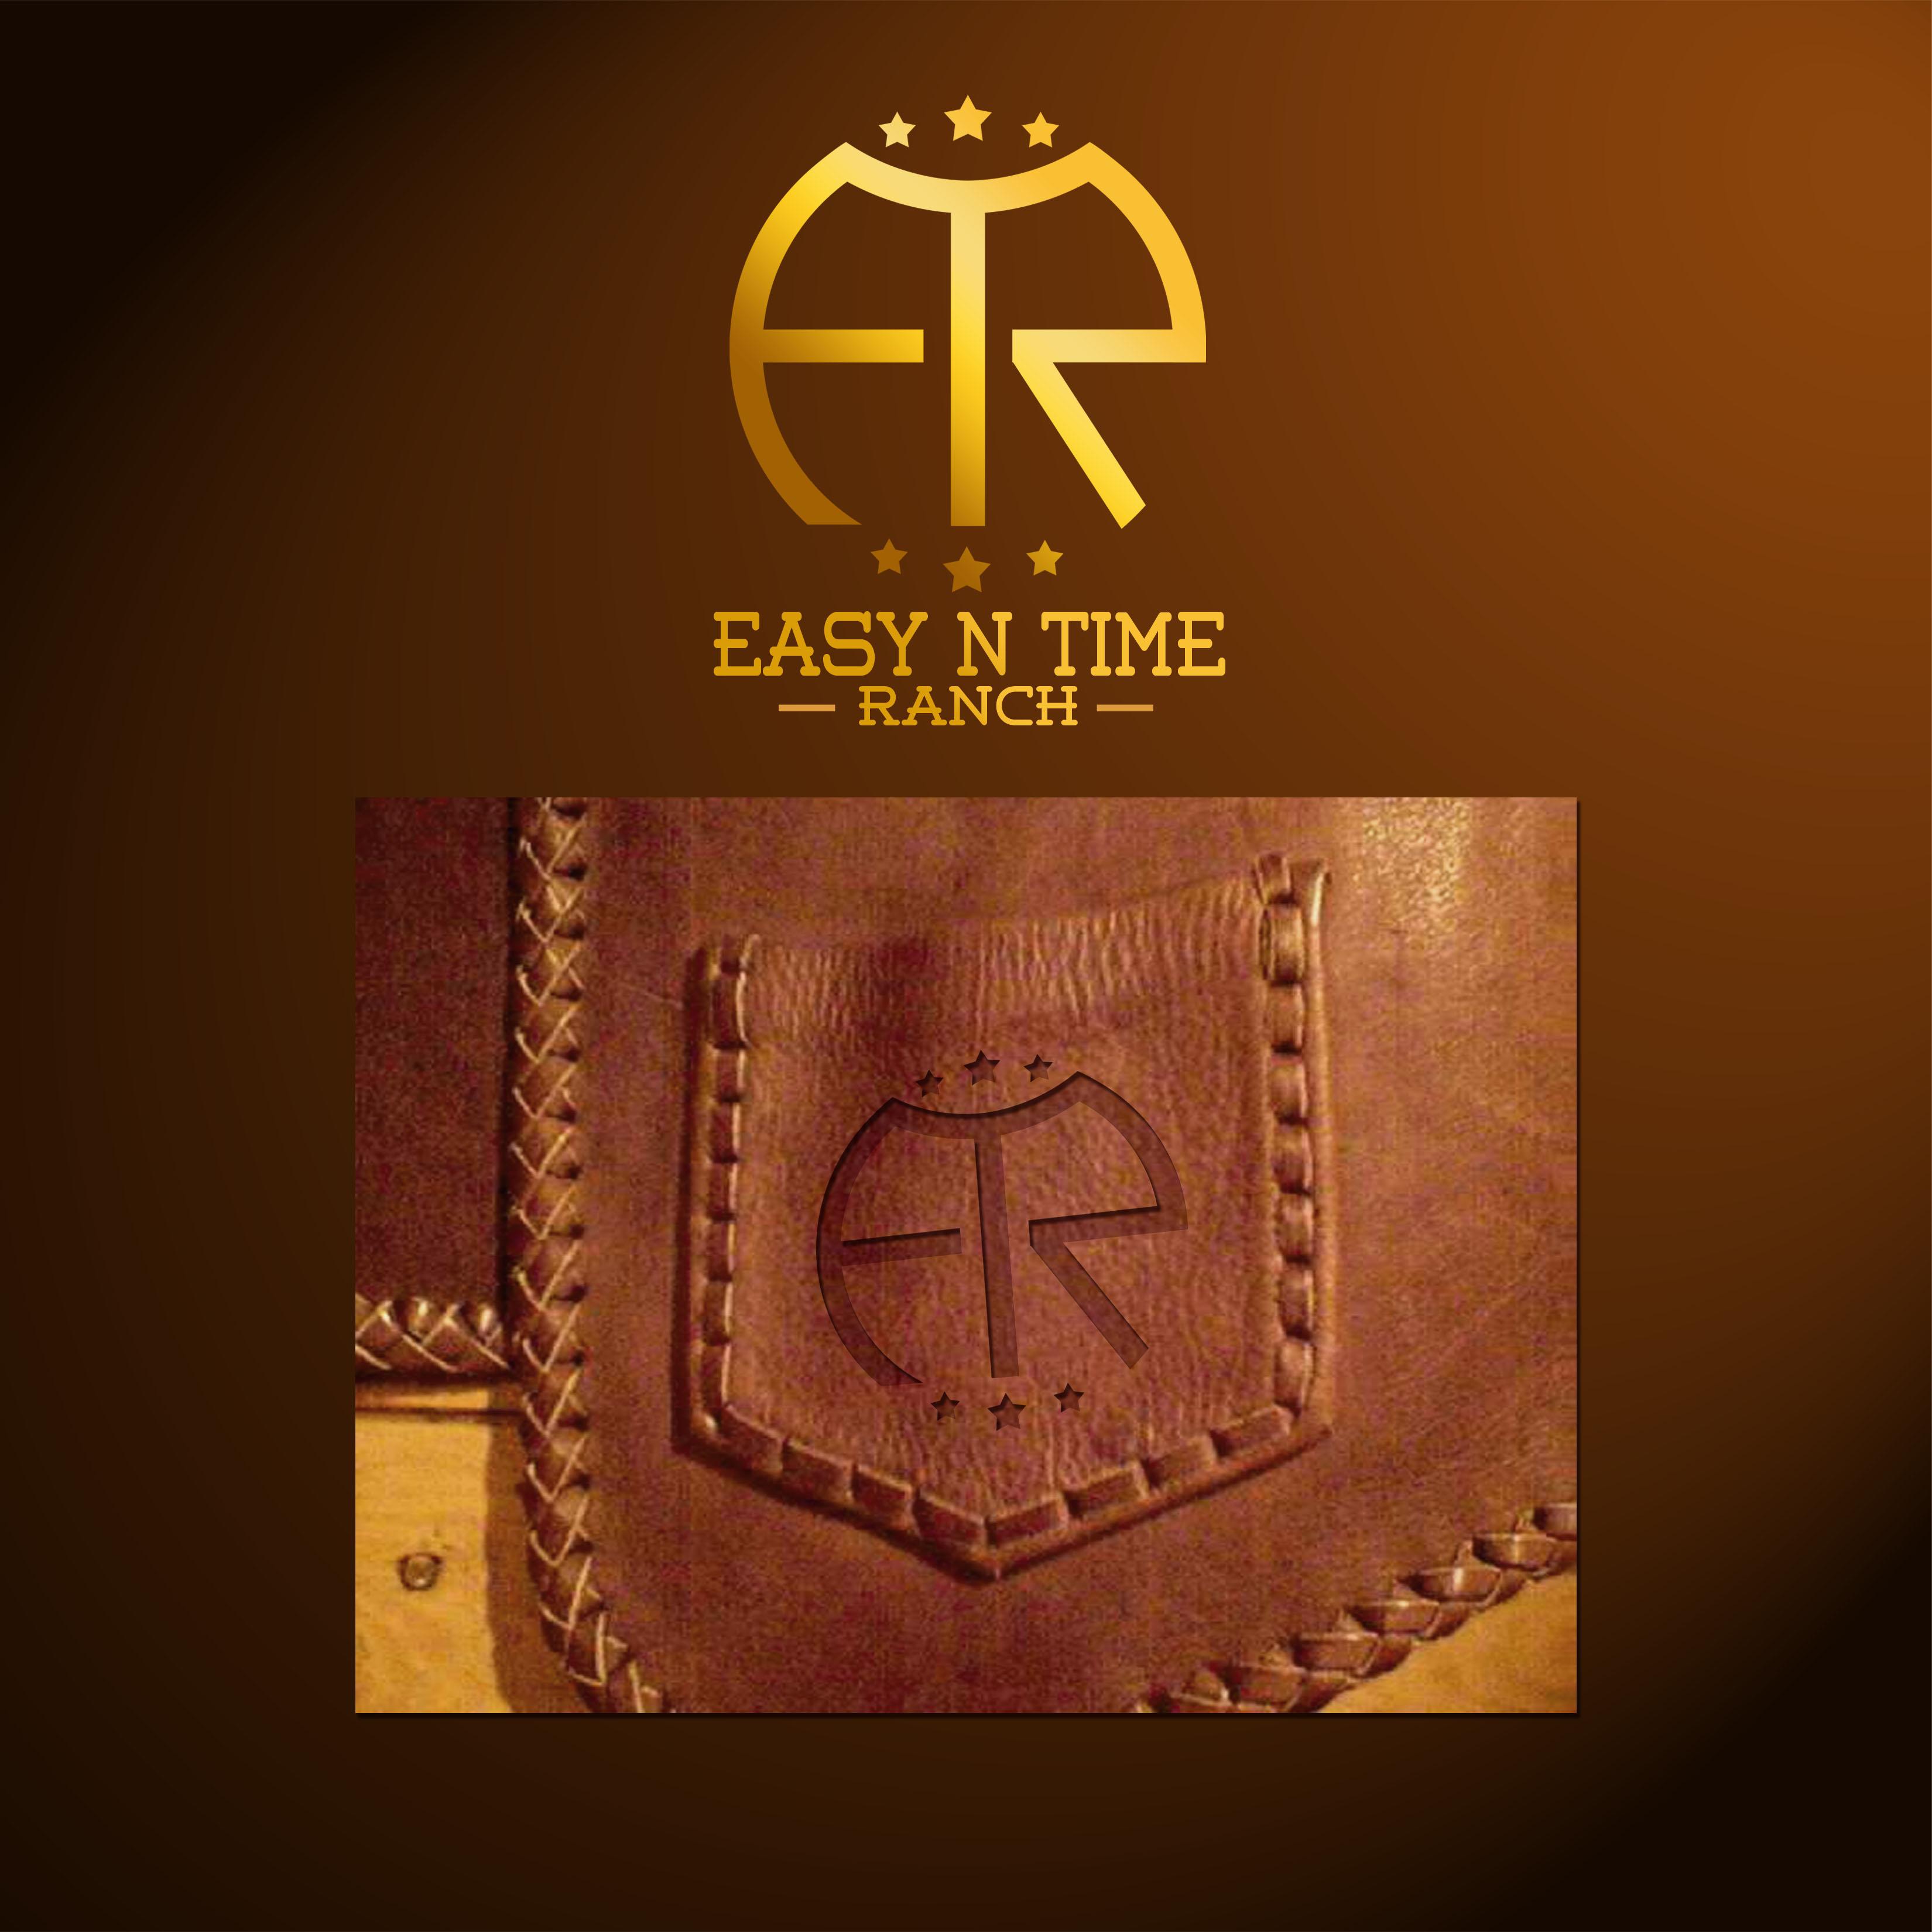 Logo Design by Allan Esclamado - Entry No. 6 in the Logo Design Contest Artistic Logo Design for Easy N Time Ranch.